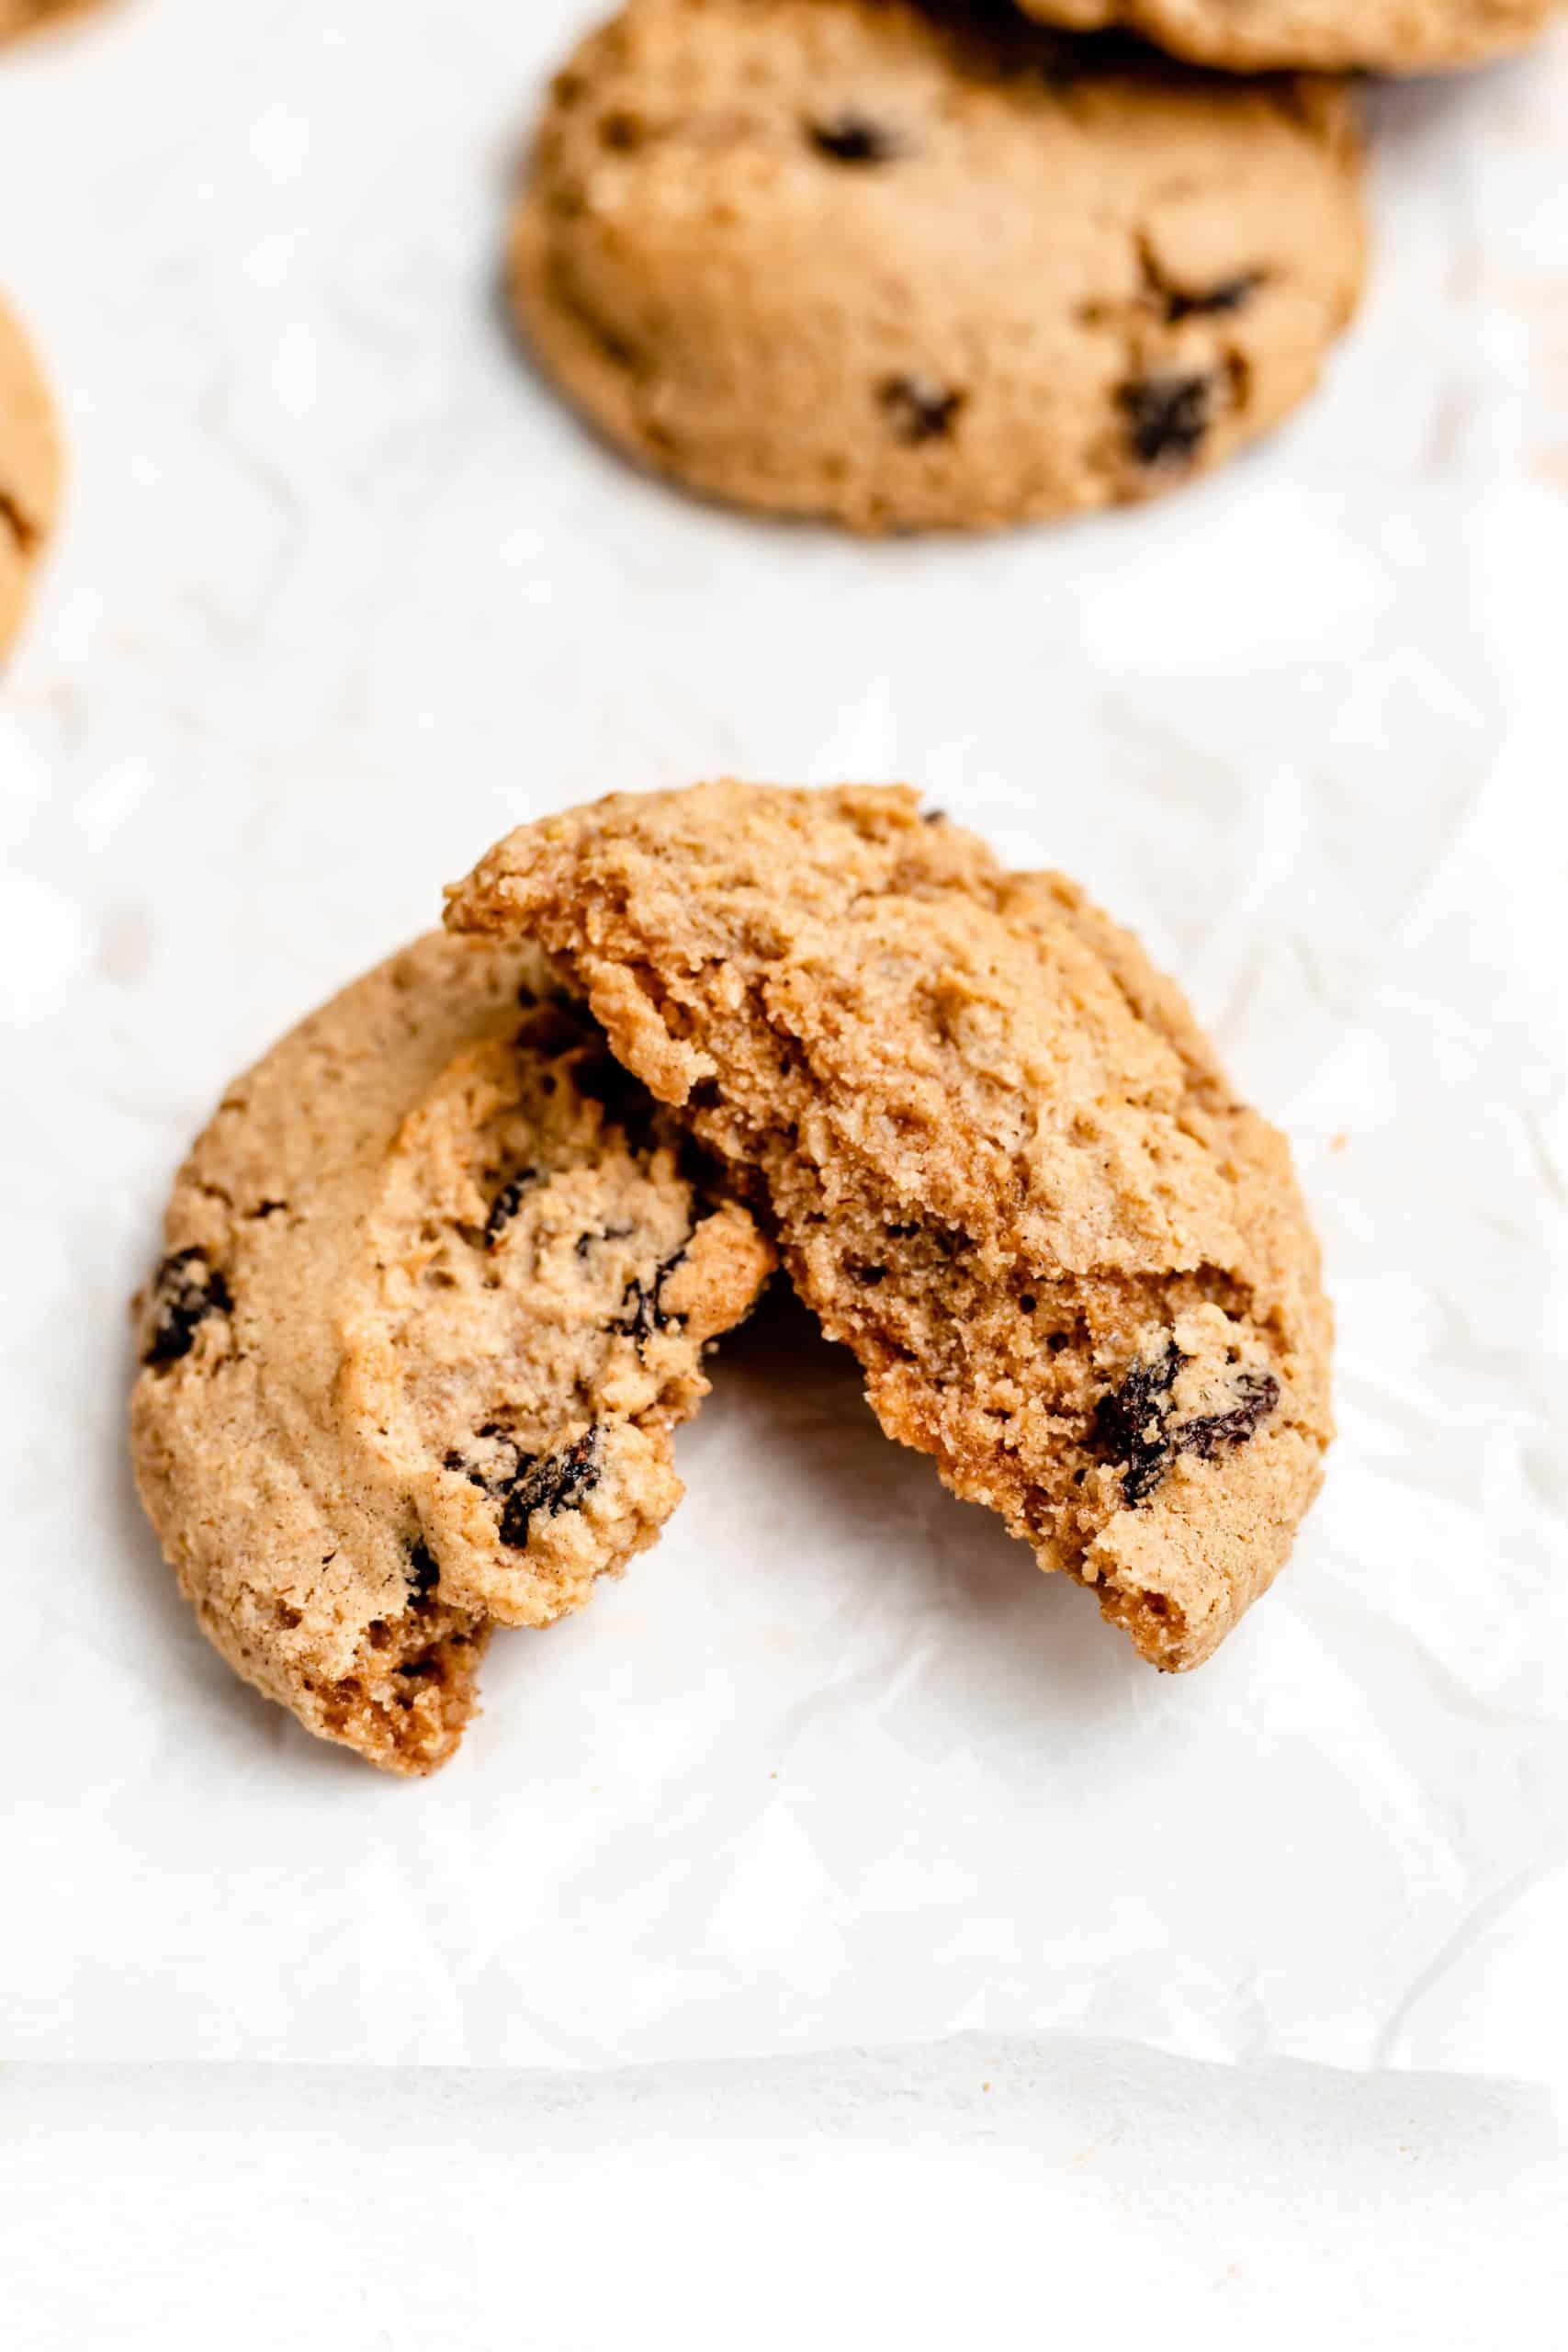 oatmeal raisin cookie cut in half